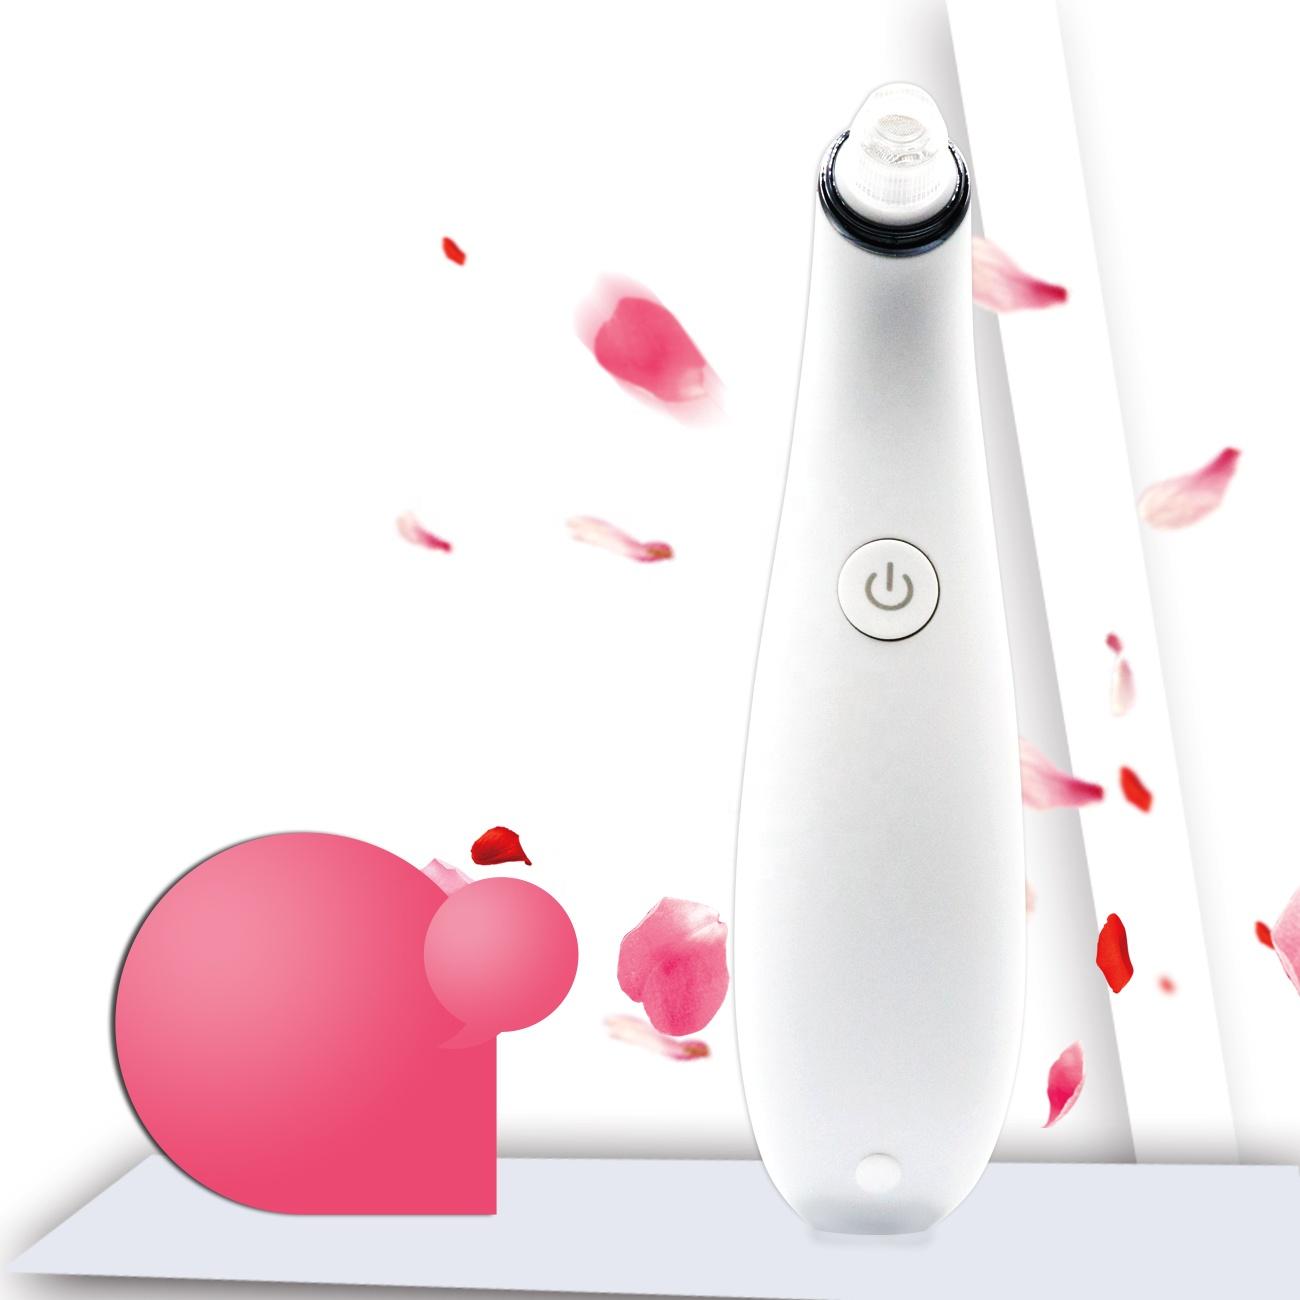 Beauty Intelligent facial cleanser deep clean Hot Products Portable Blackhead Remover Vacuum Amazon hot model